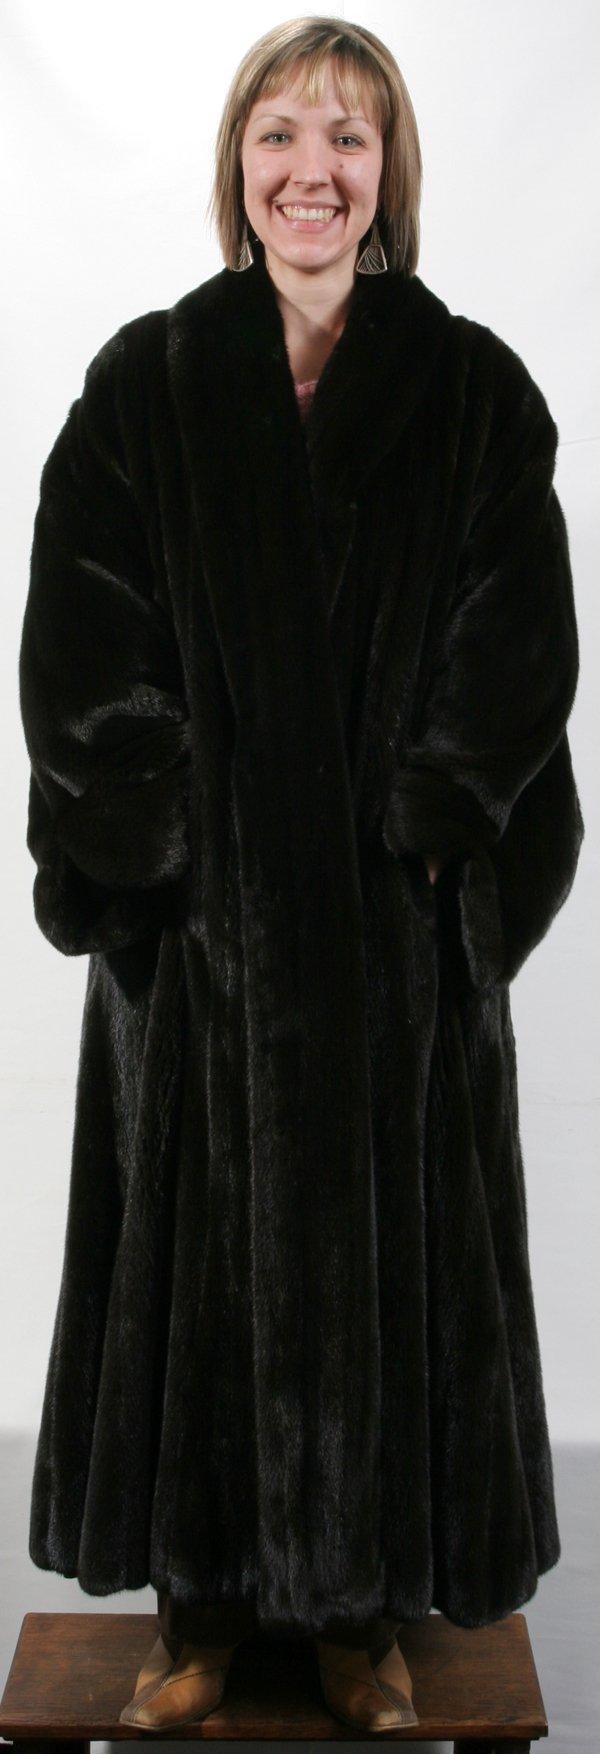 021392 neiman marcus label mink coat lot 21392. Black Bedroom Furniture Sets. Home Design Ideas